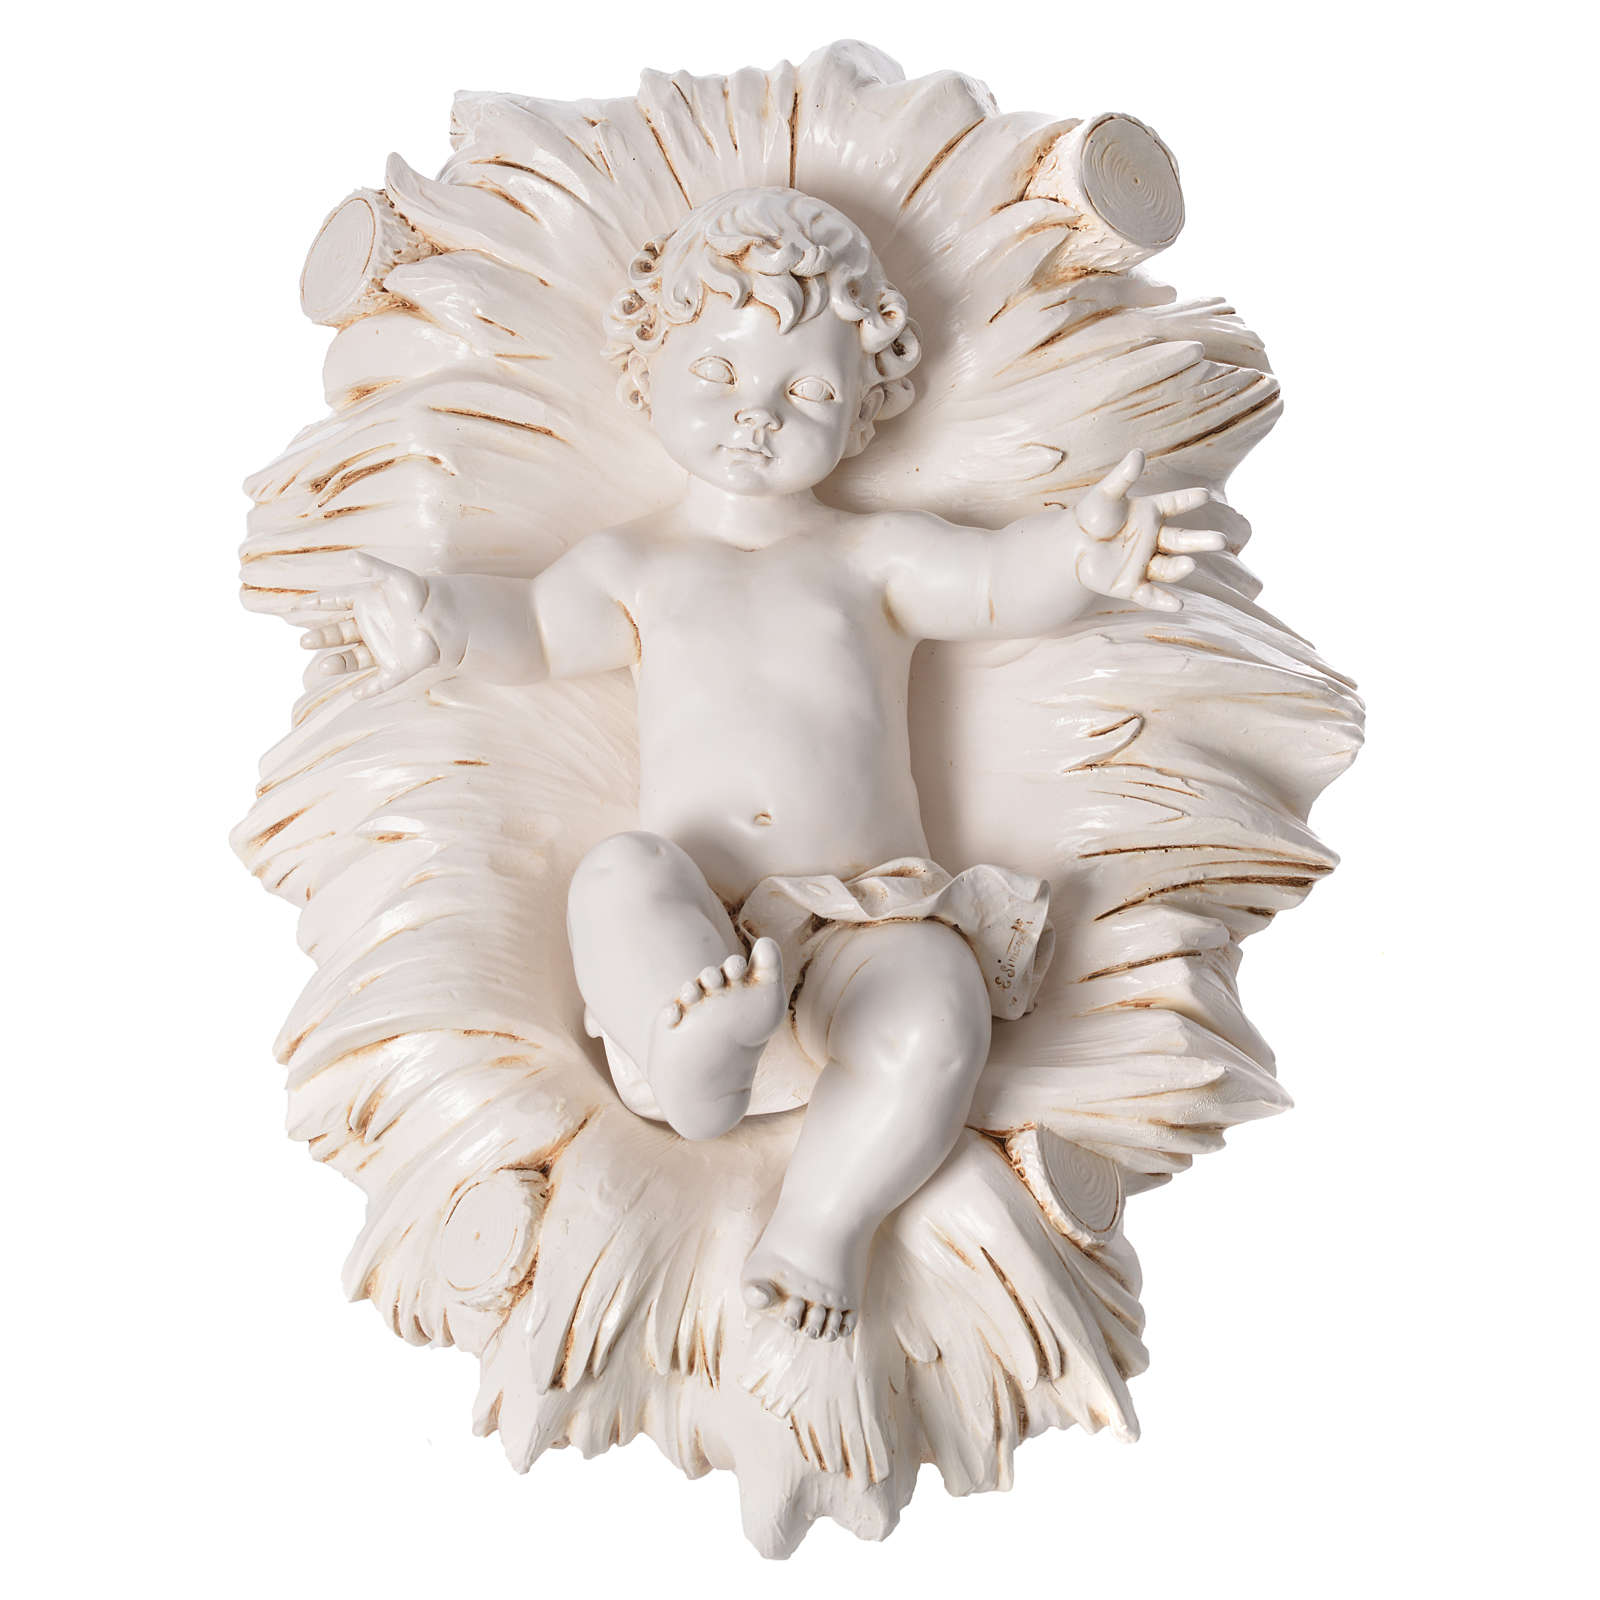 Natività 125 cm resina Fontanini fin. Siena 4